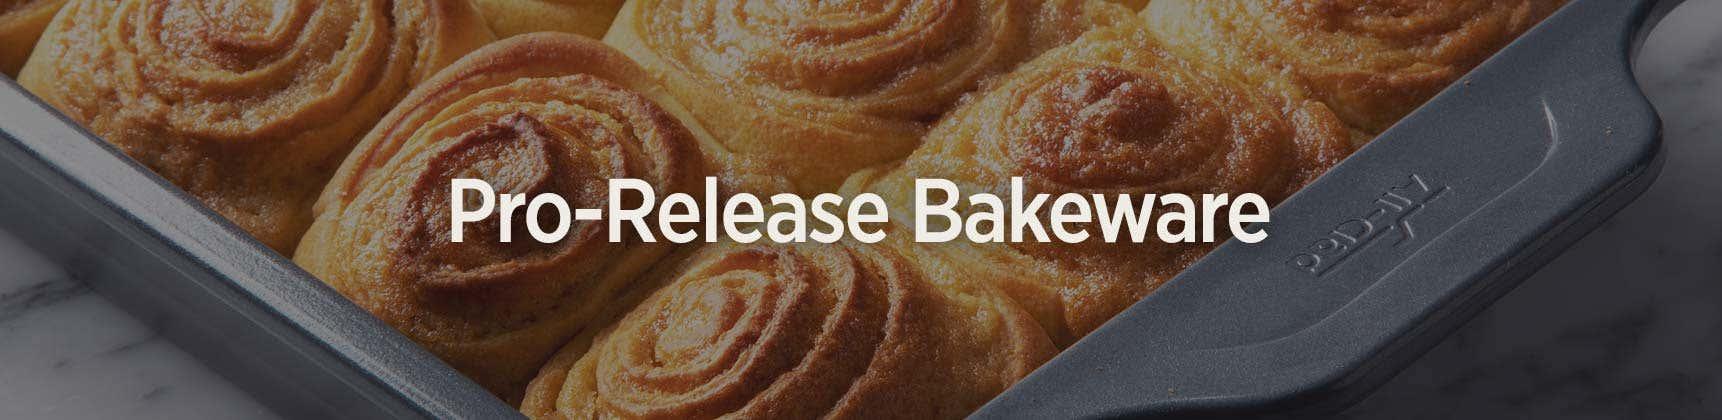 Pro-Release Bakeware